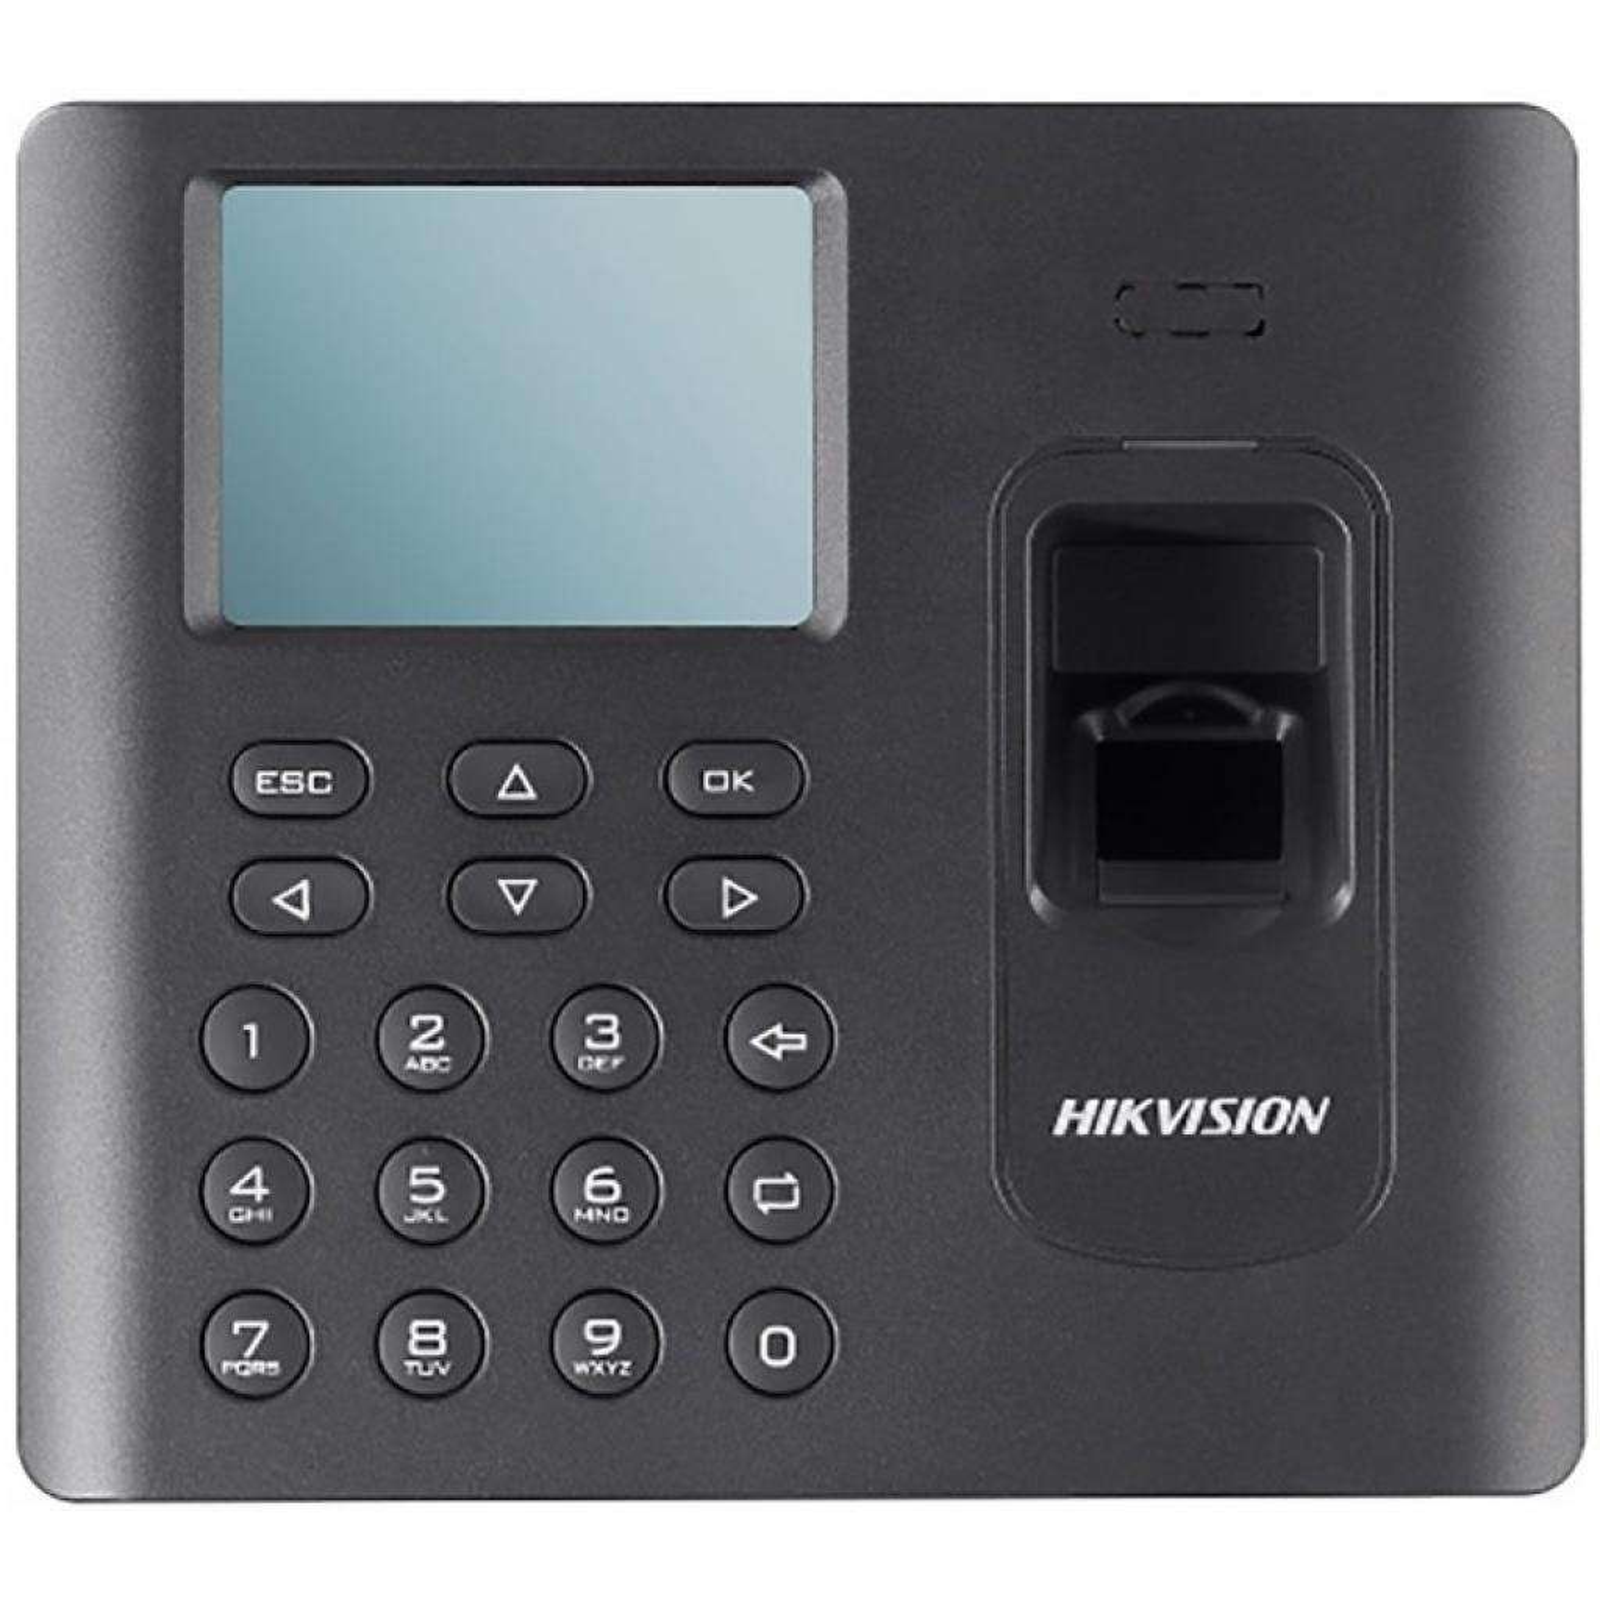 Контроллер доступа Hikvision DS-K1A802MF